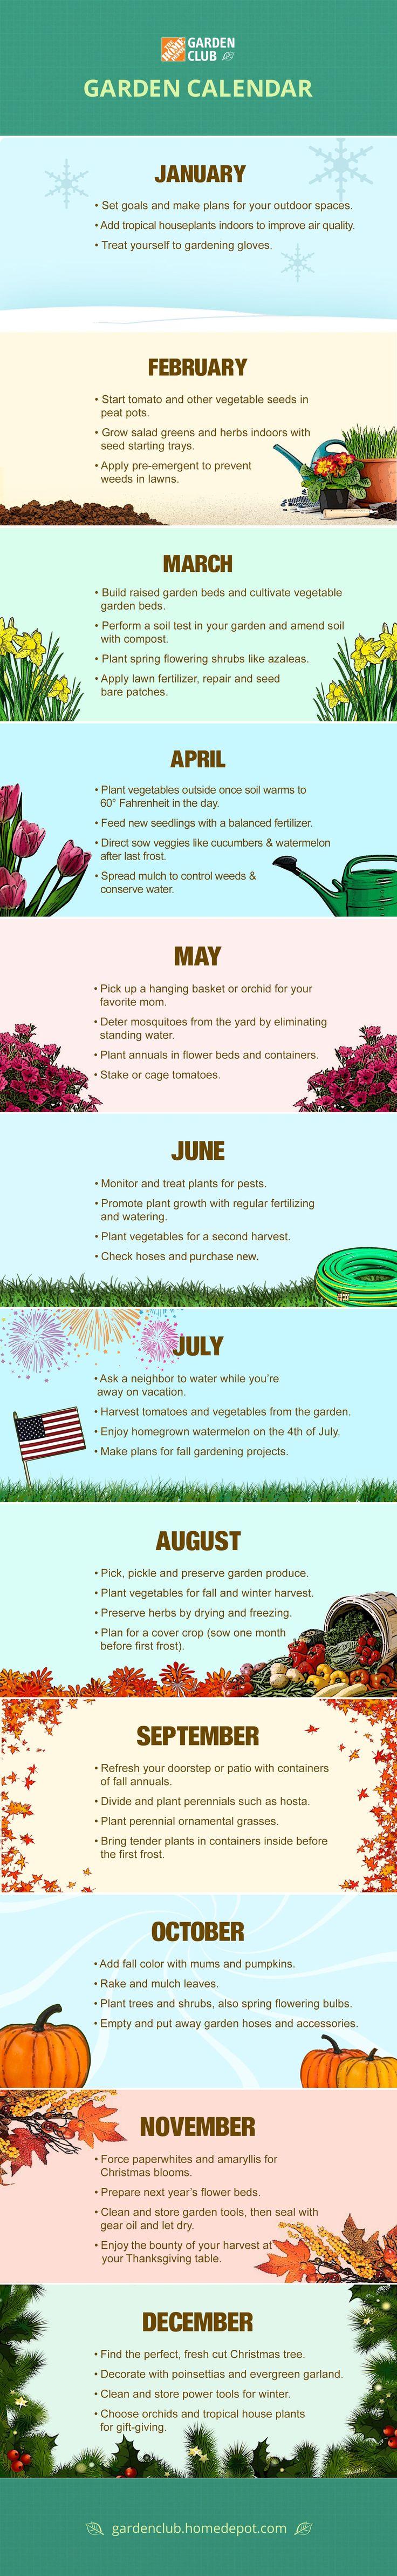 Nursery Calendar Ideas : Best ideas about garden club on pinterest gardening